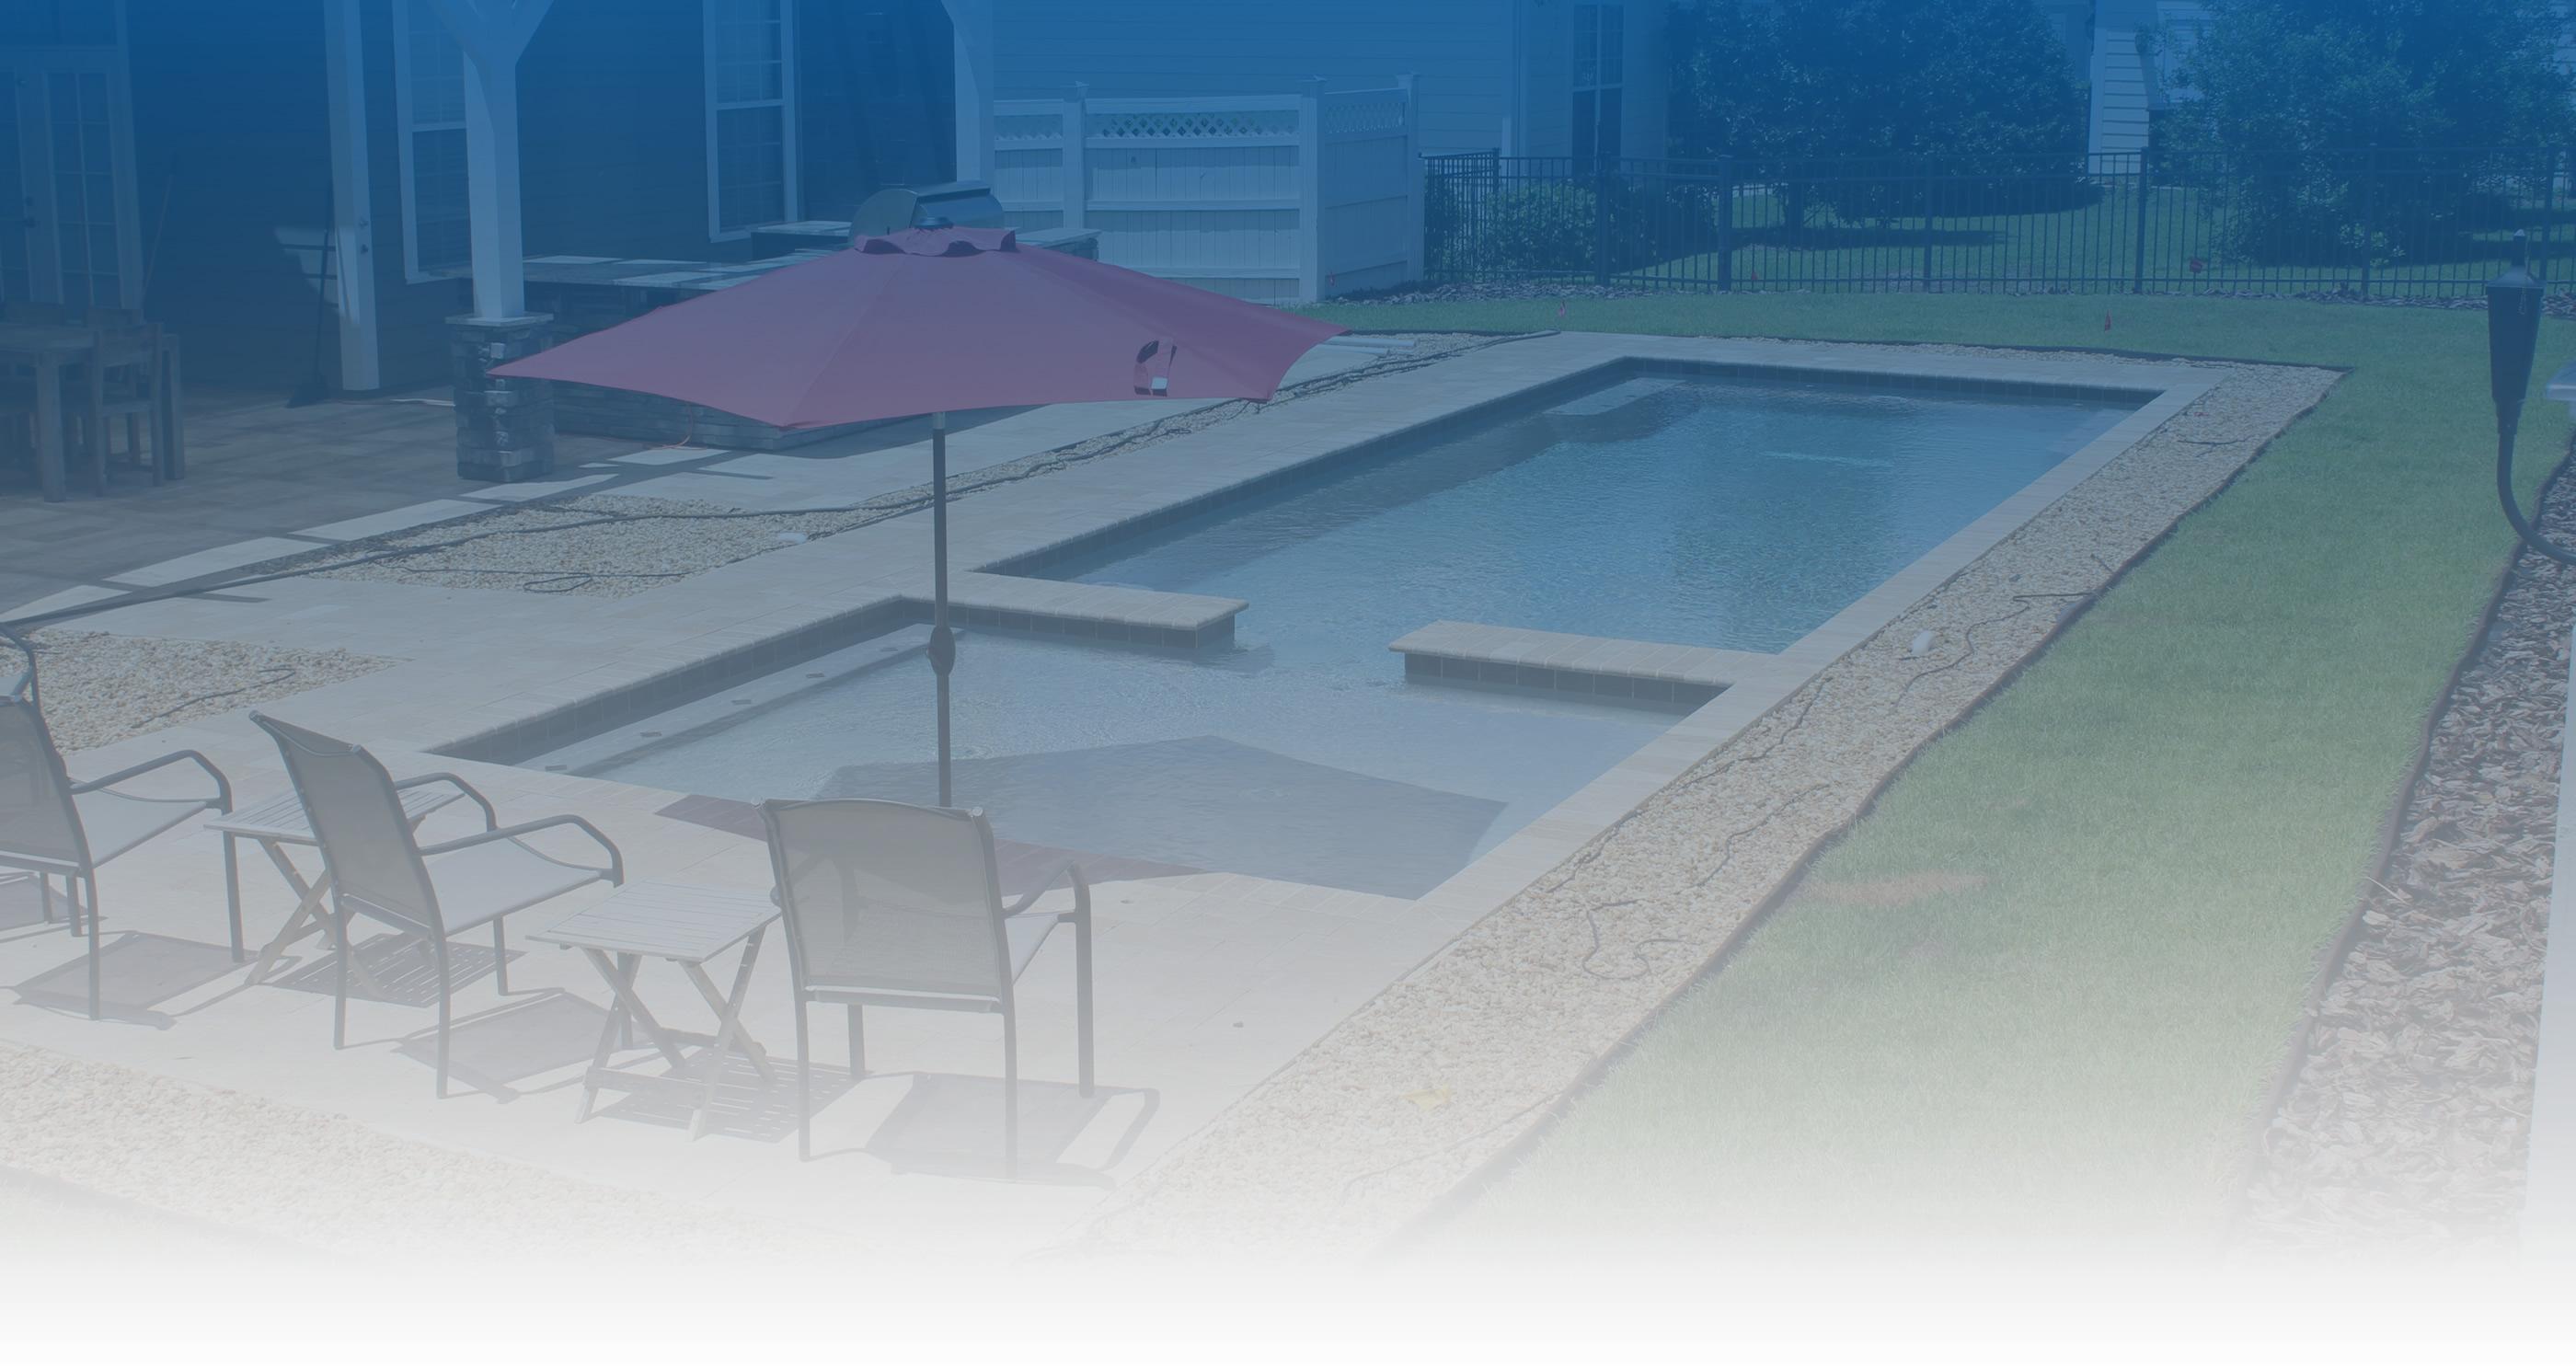 Salvo pools tallahassee and north florida pool builder for Tallahassee pool builders